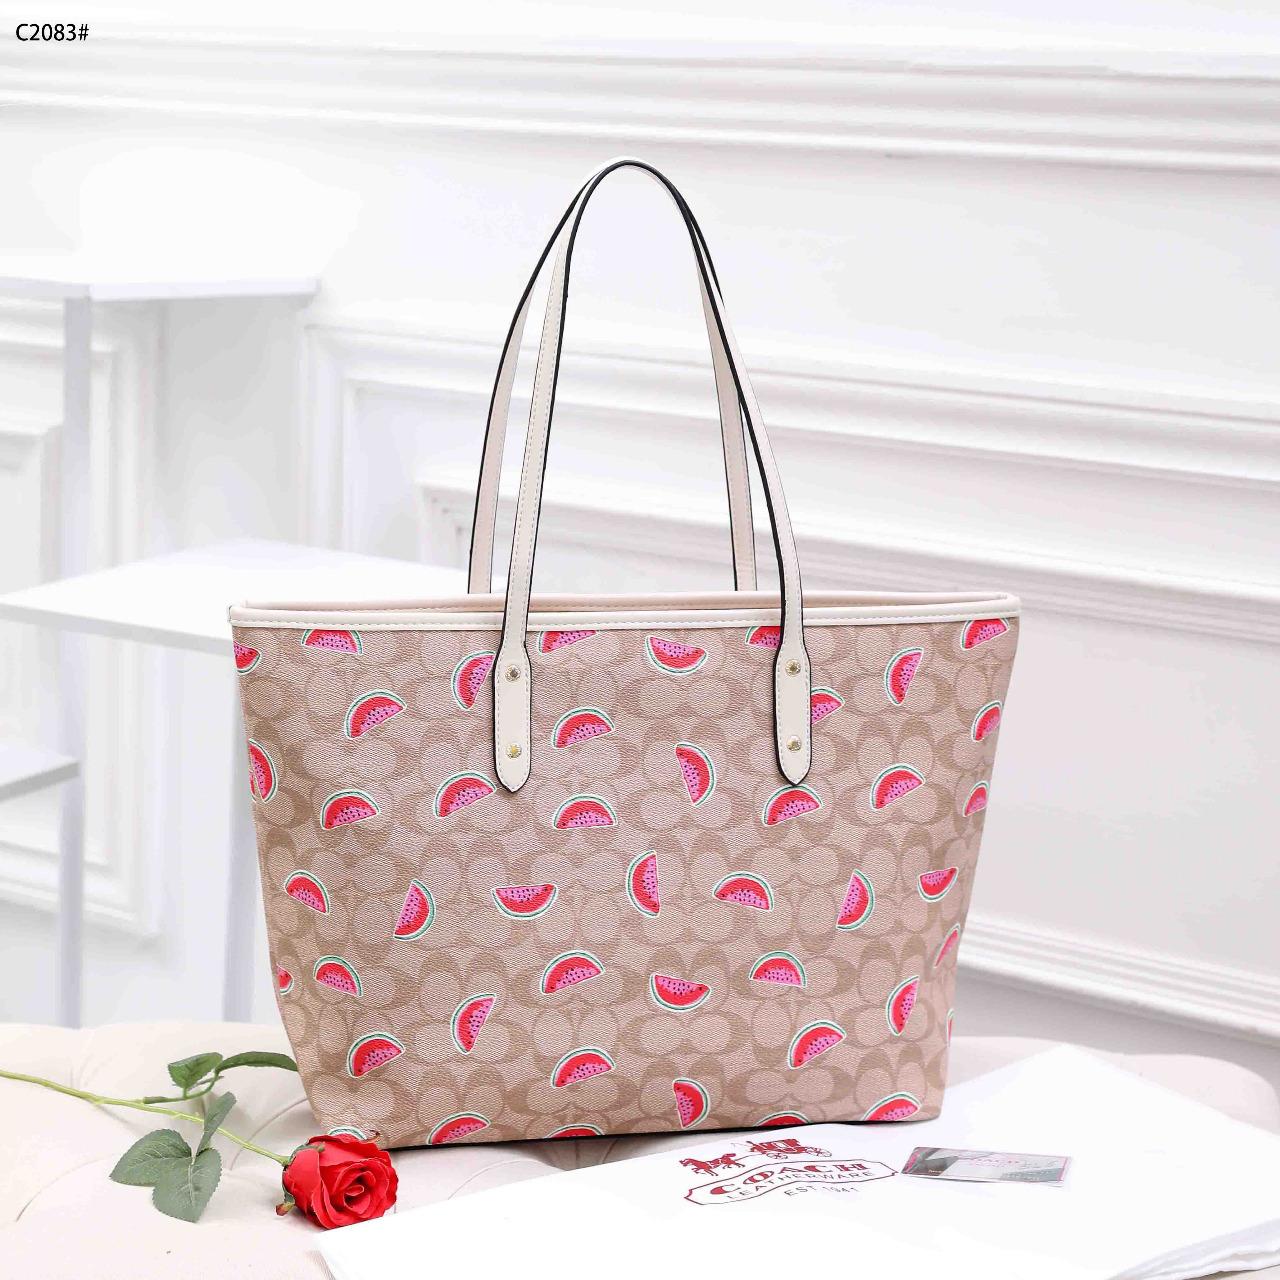 tas wanita selempang teraru shopee 2020 2021 branded 2022 ...